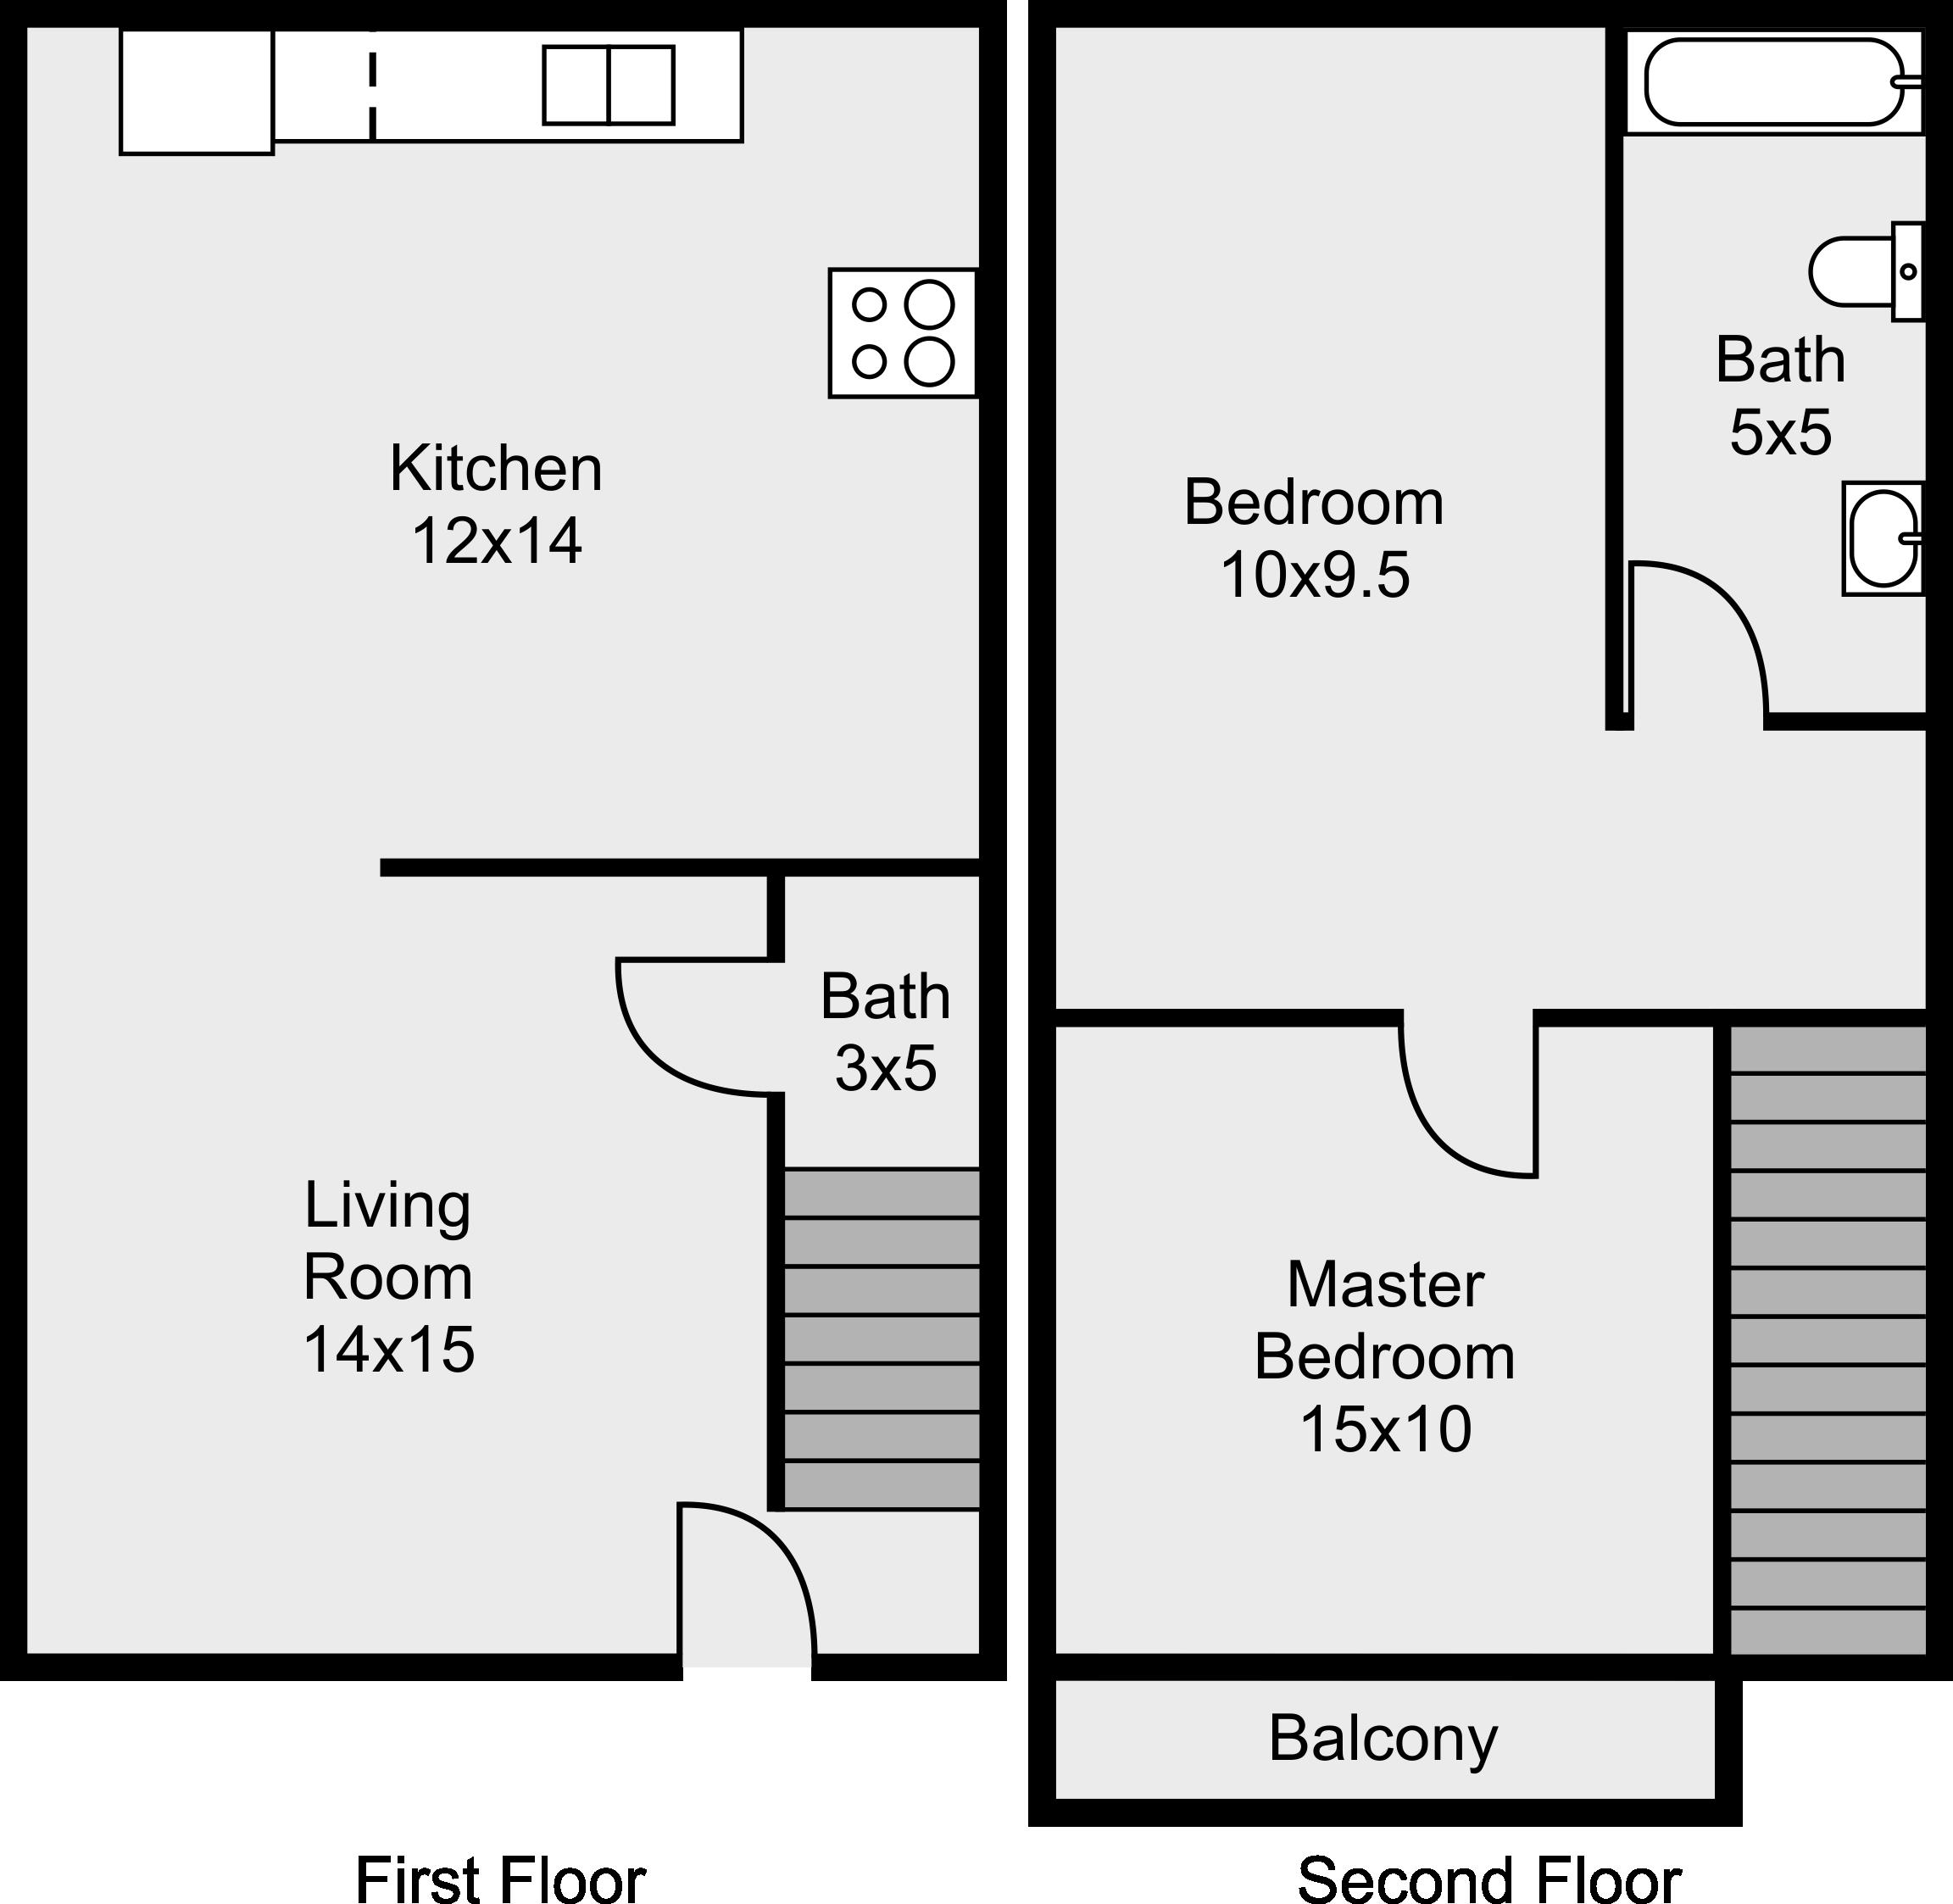 floor plans - college park apartments - murfreesboro, tennessee